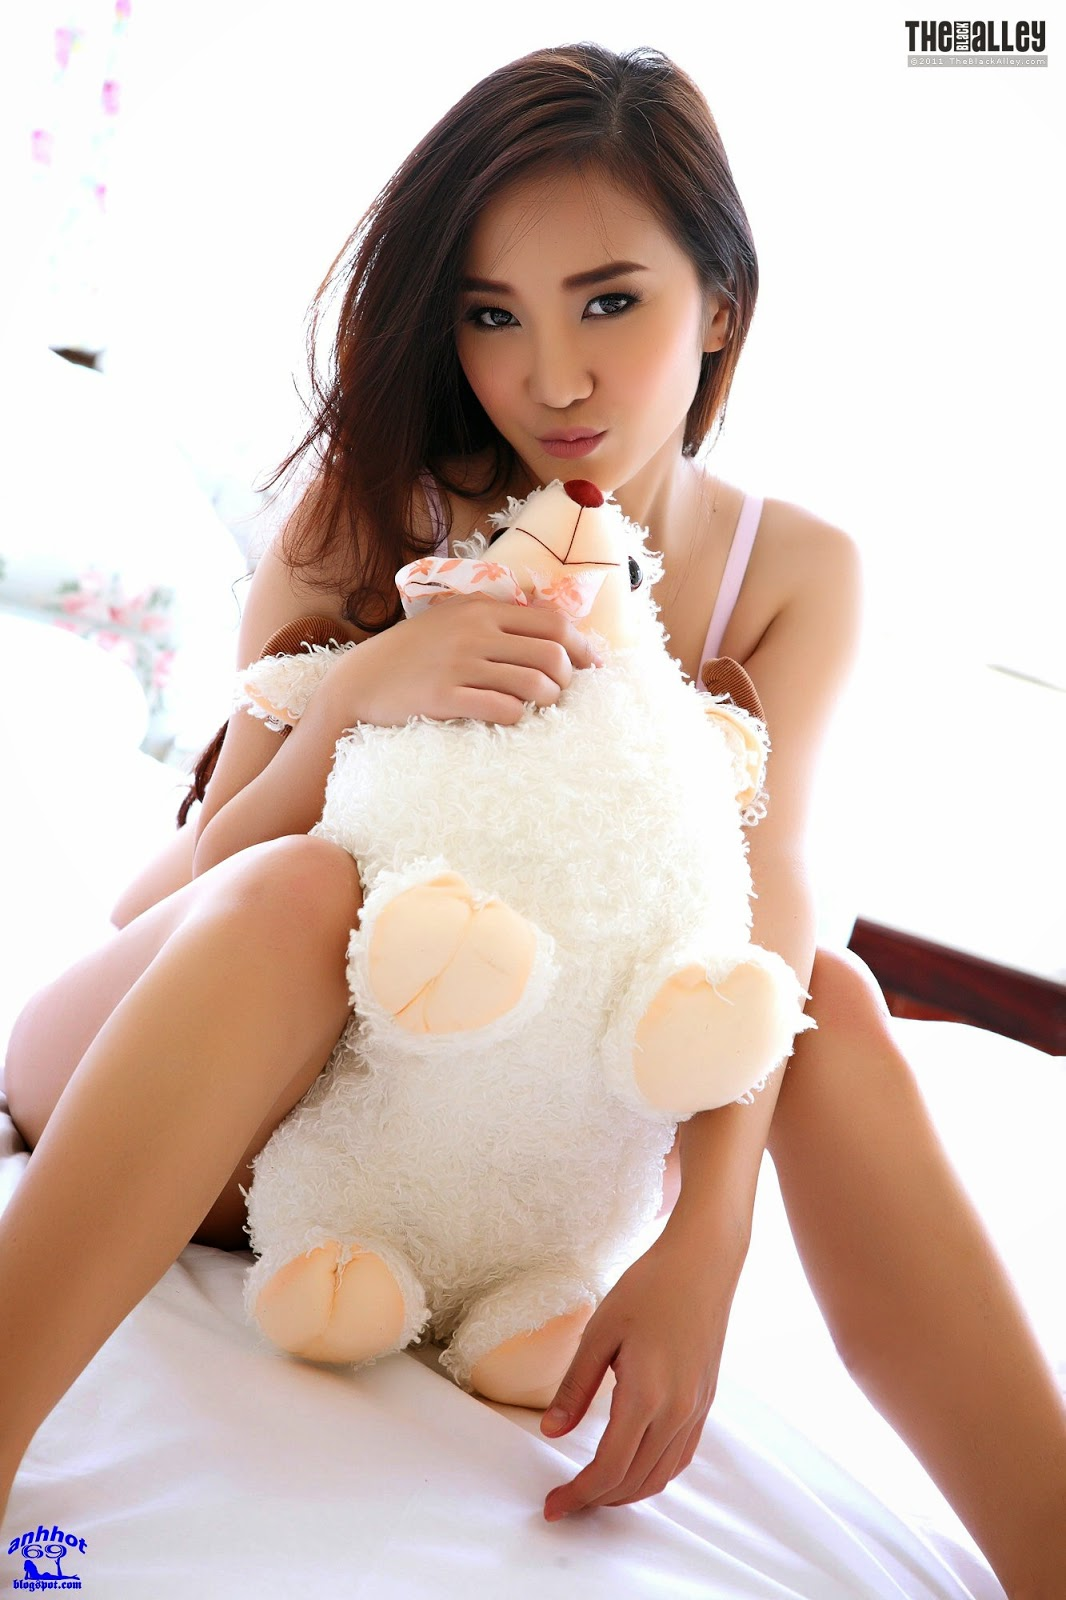 lolita-cheng-64-031